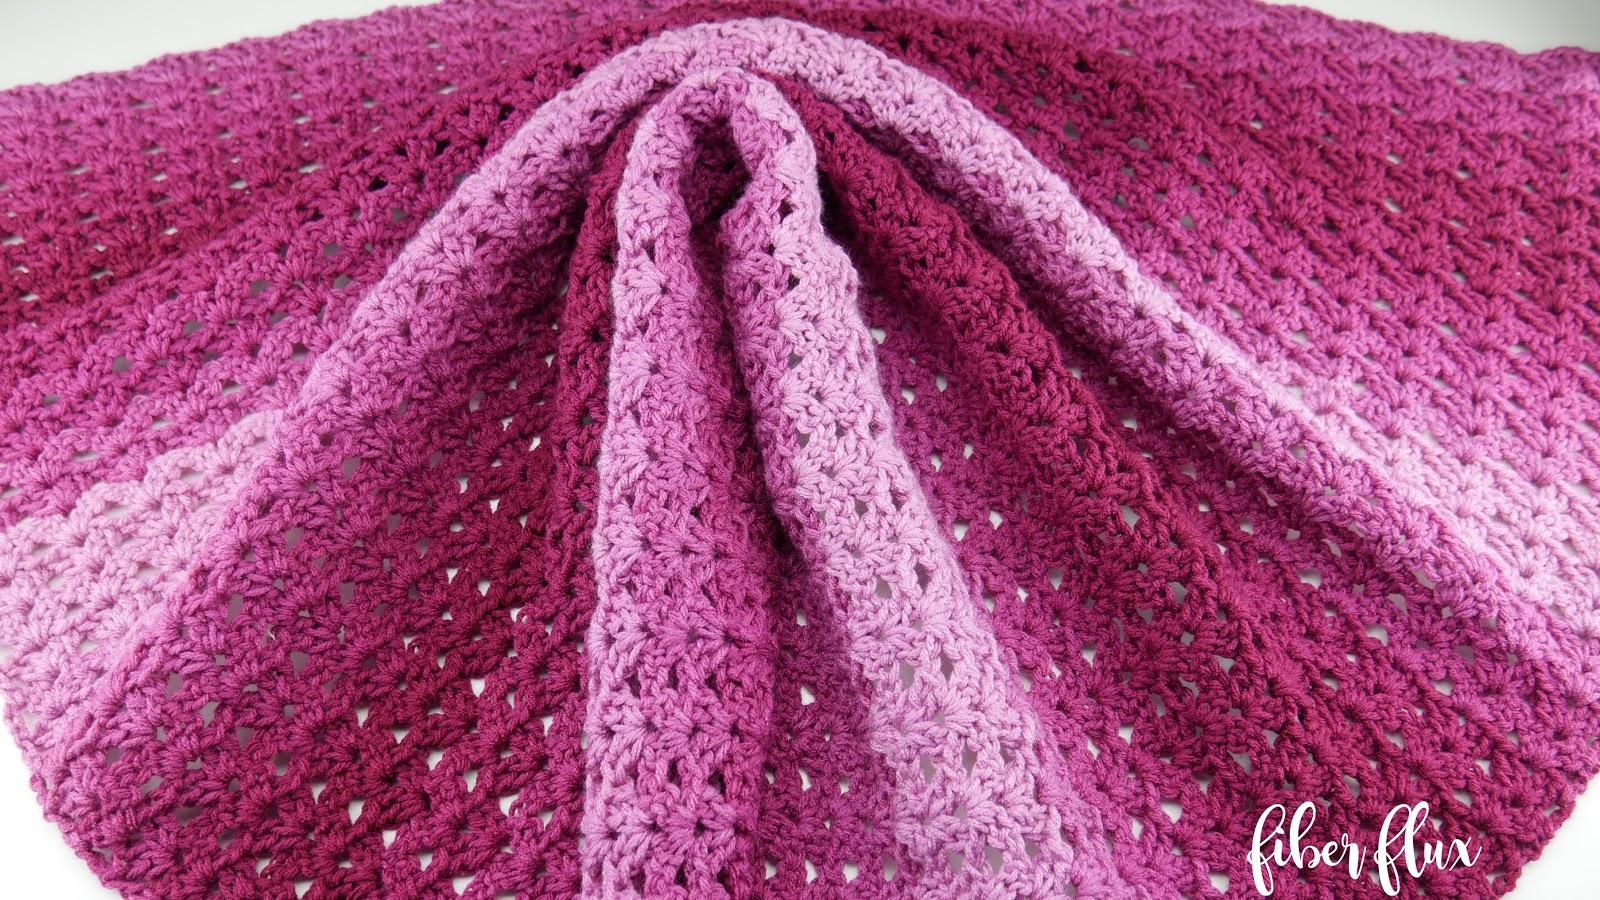 Fiber Flux: Free Crochet Pattern...Briar Rose Blanket!